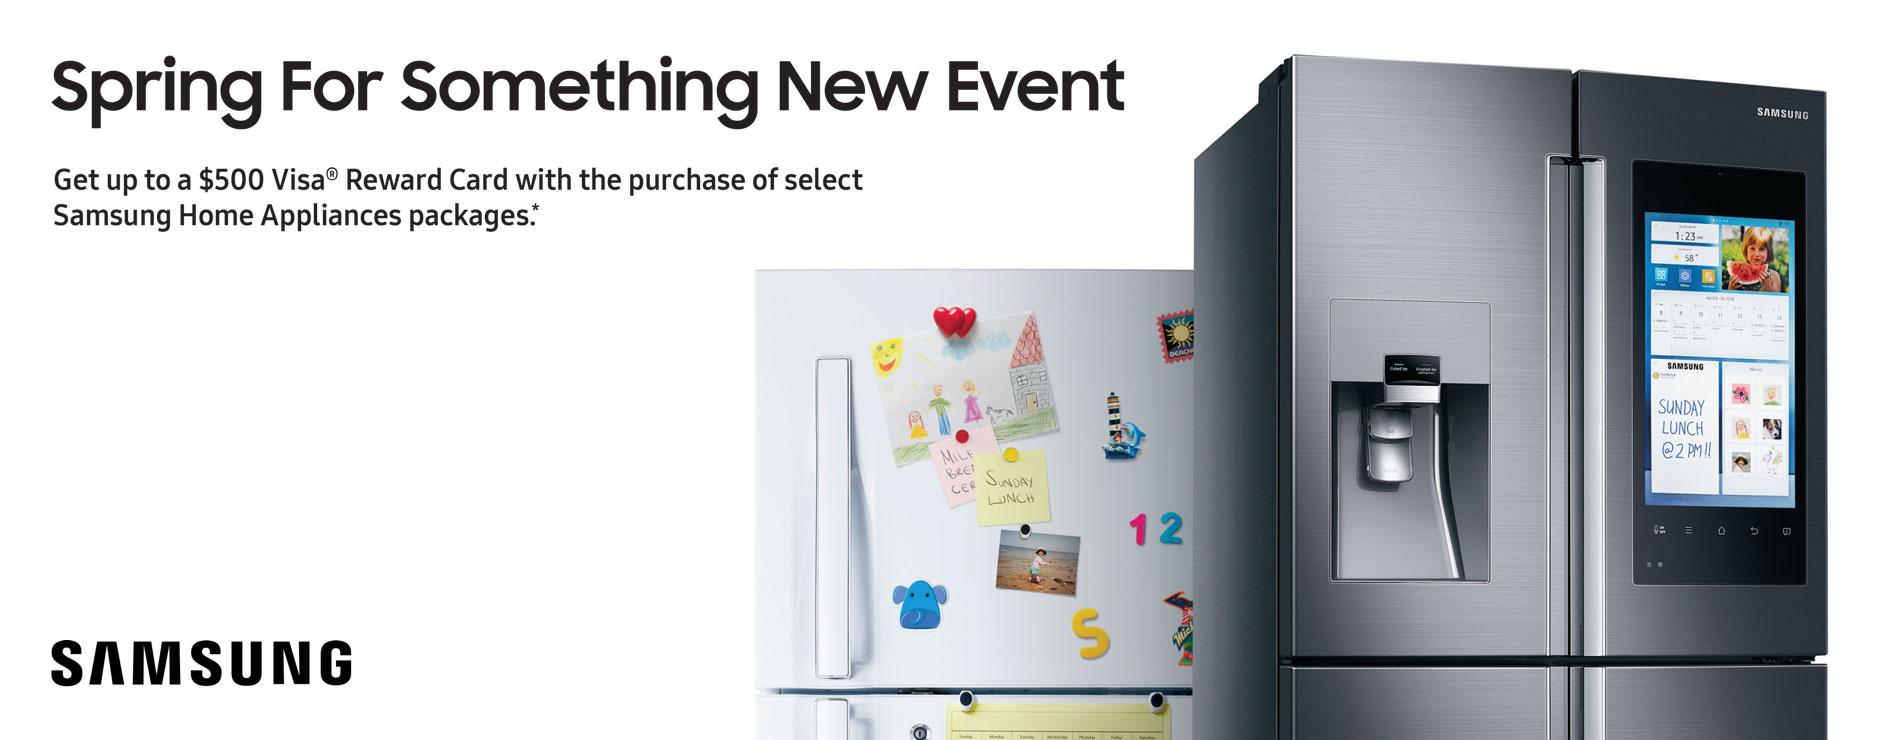 Samsung Spring for Something New